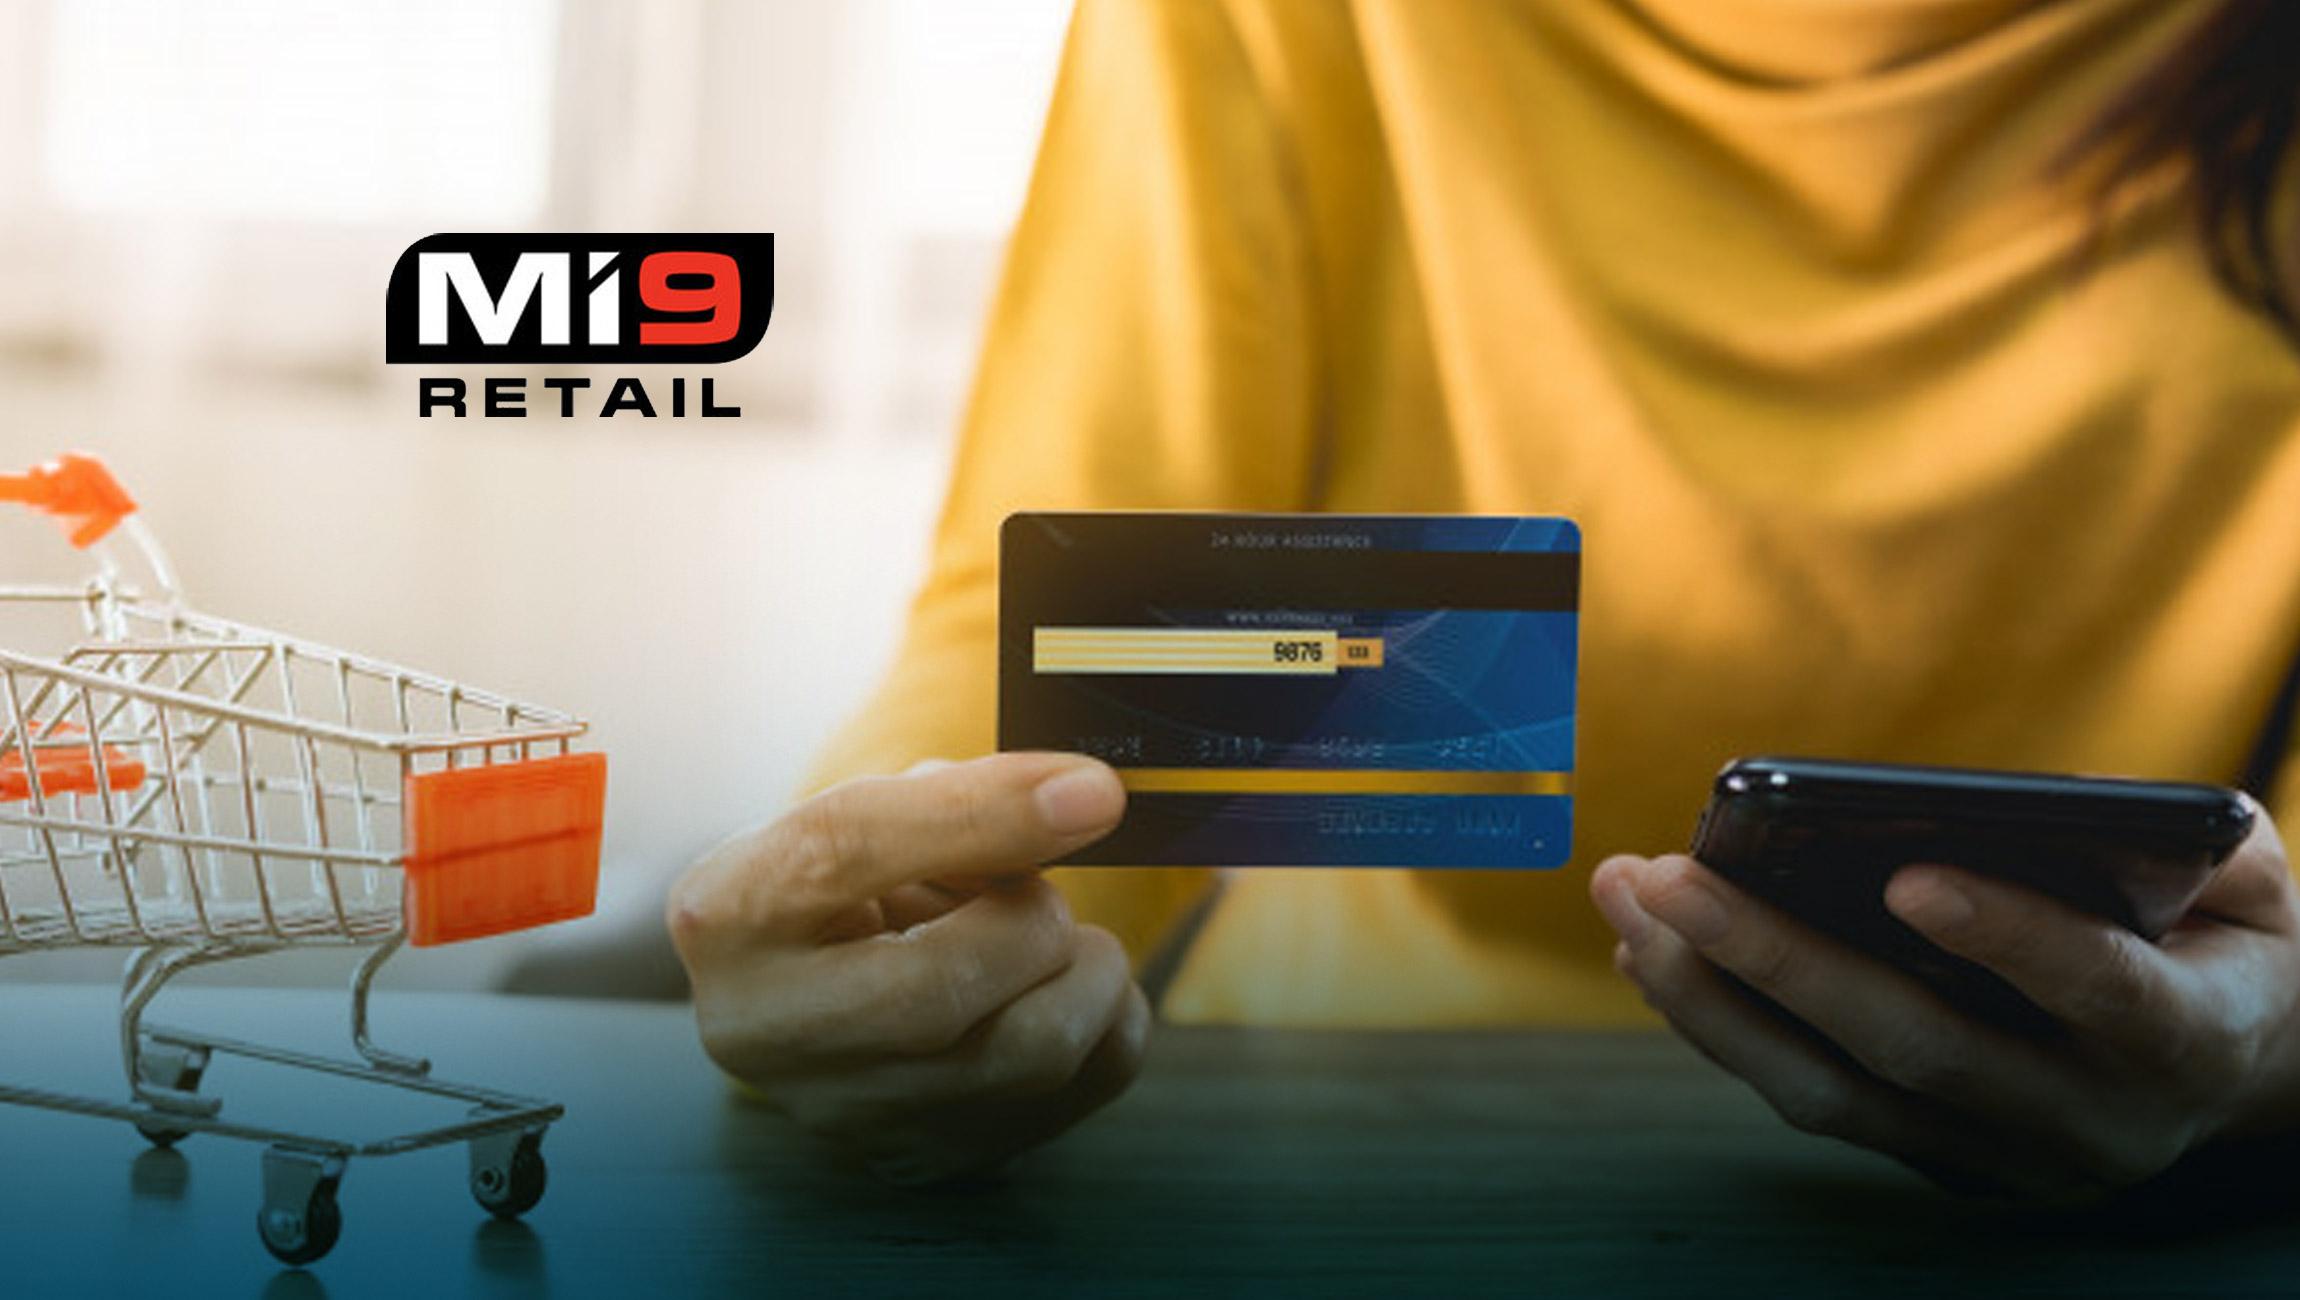 Mi9 Retail Launches ThryveAI